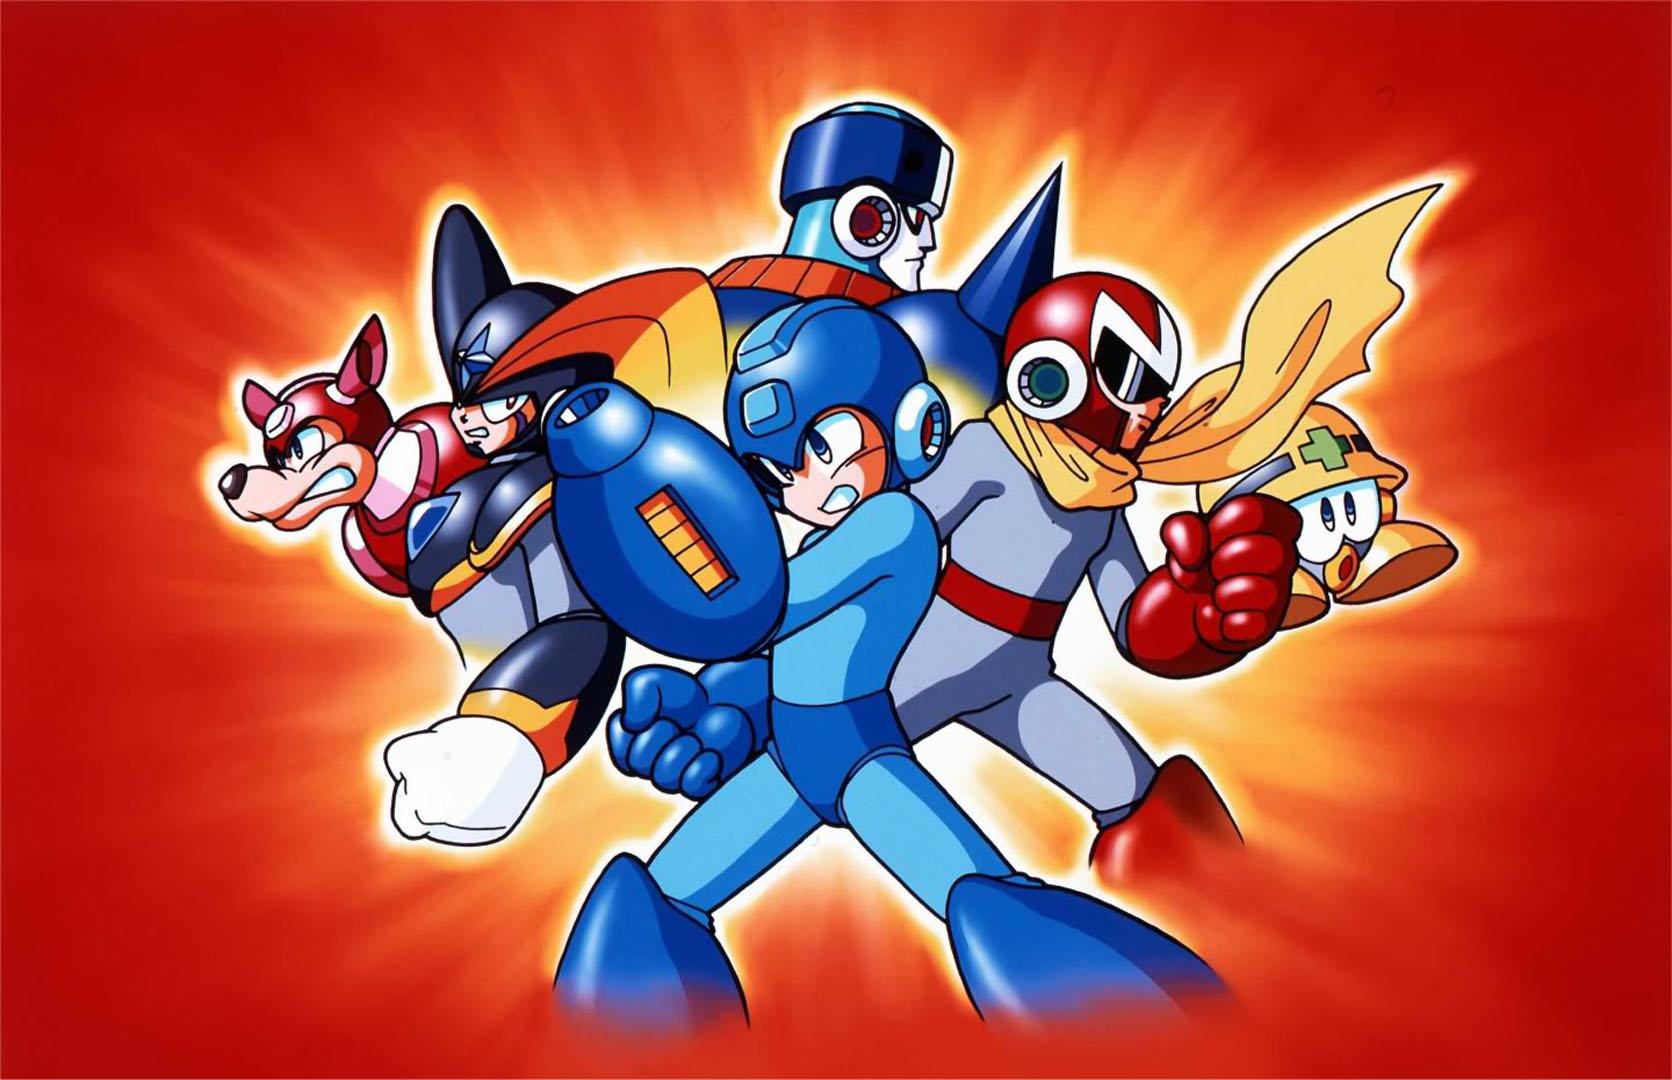 The Megaman Team